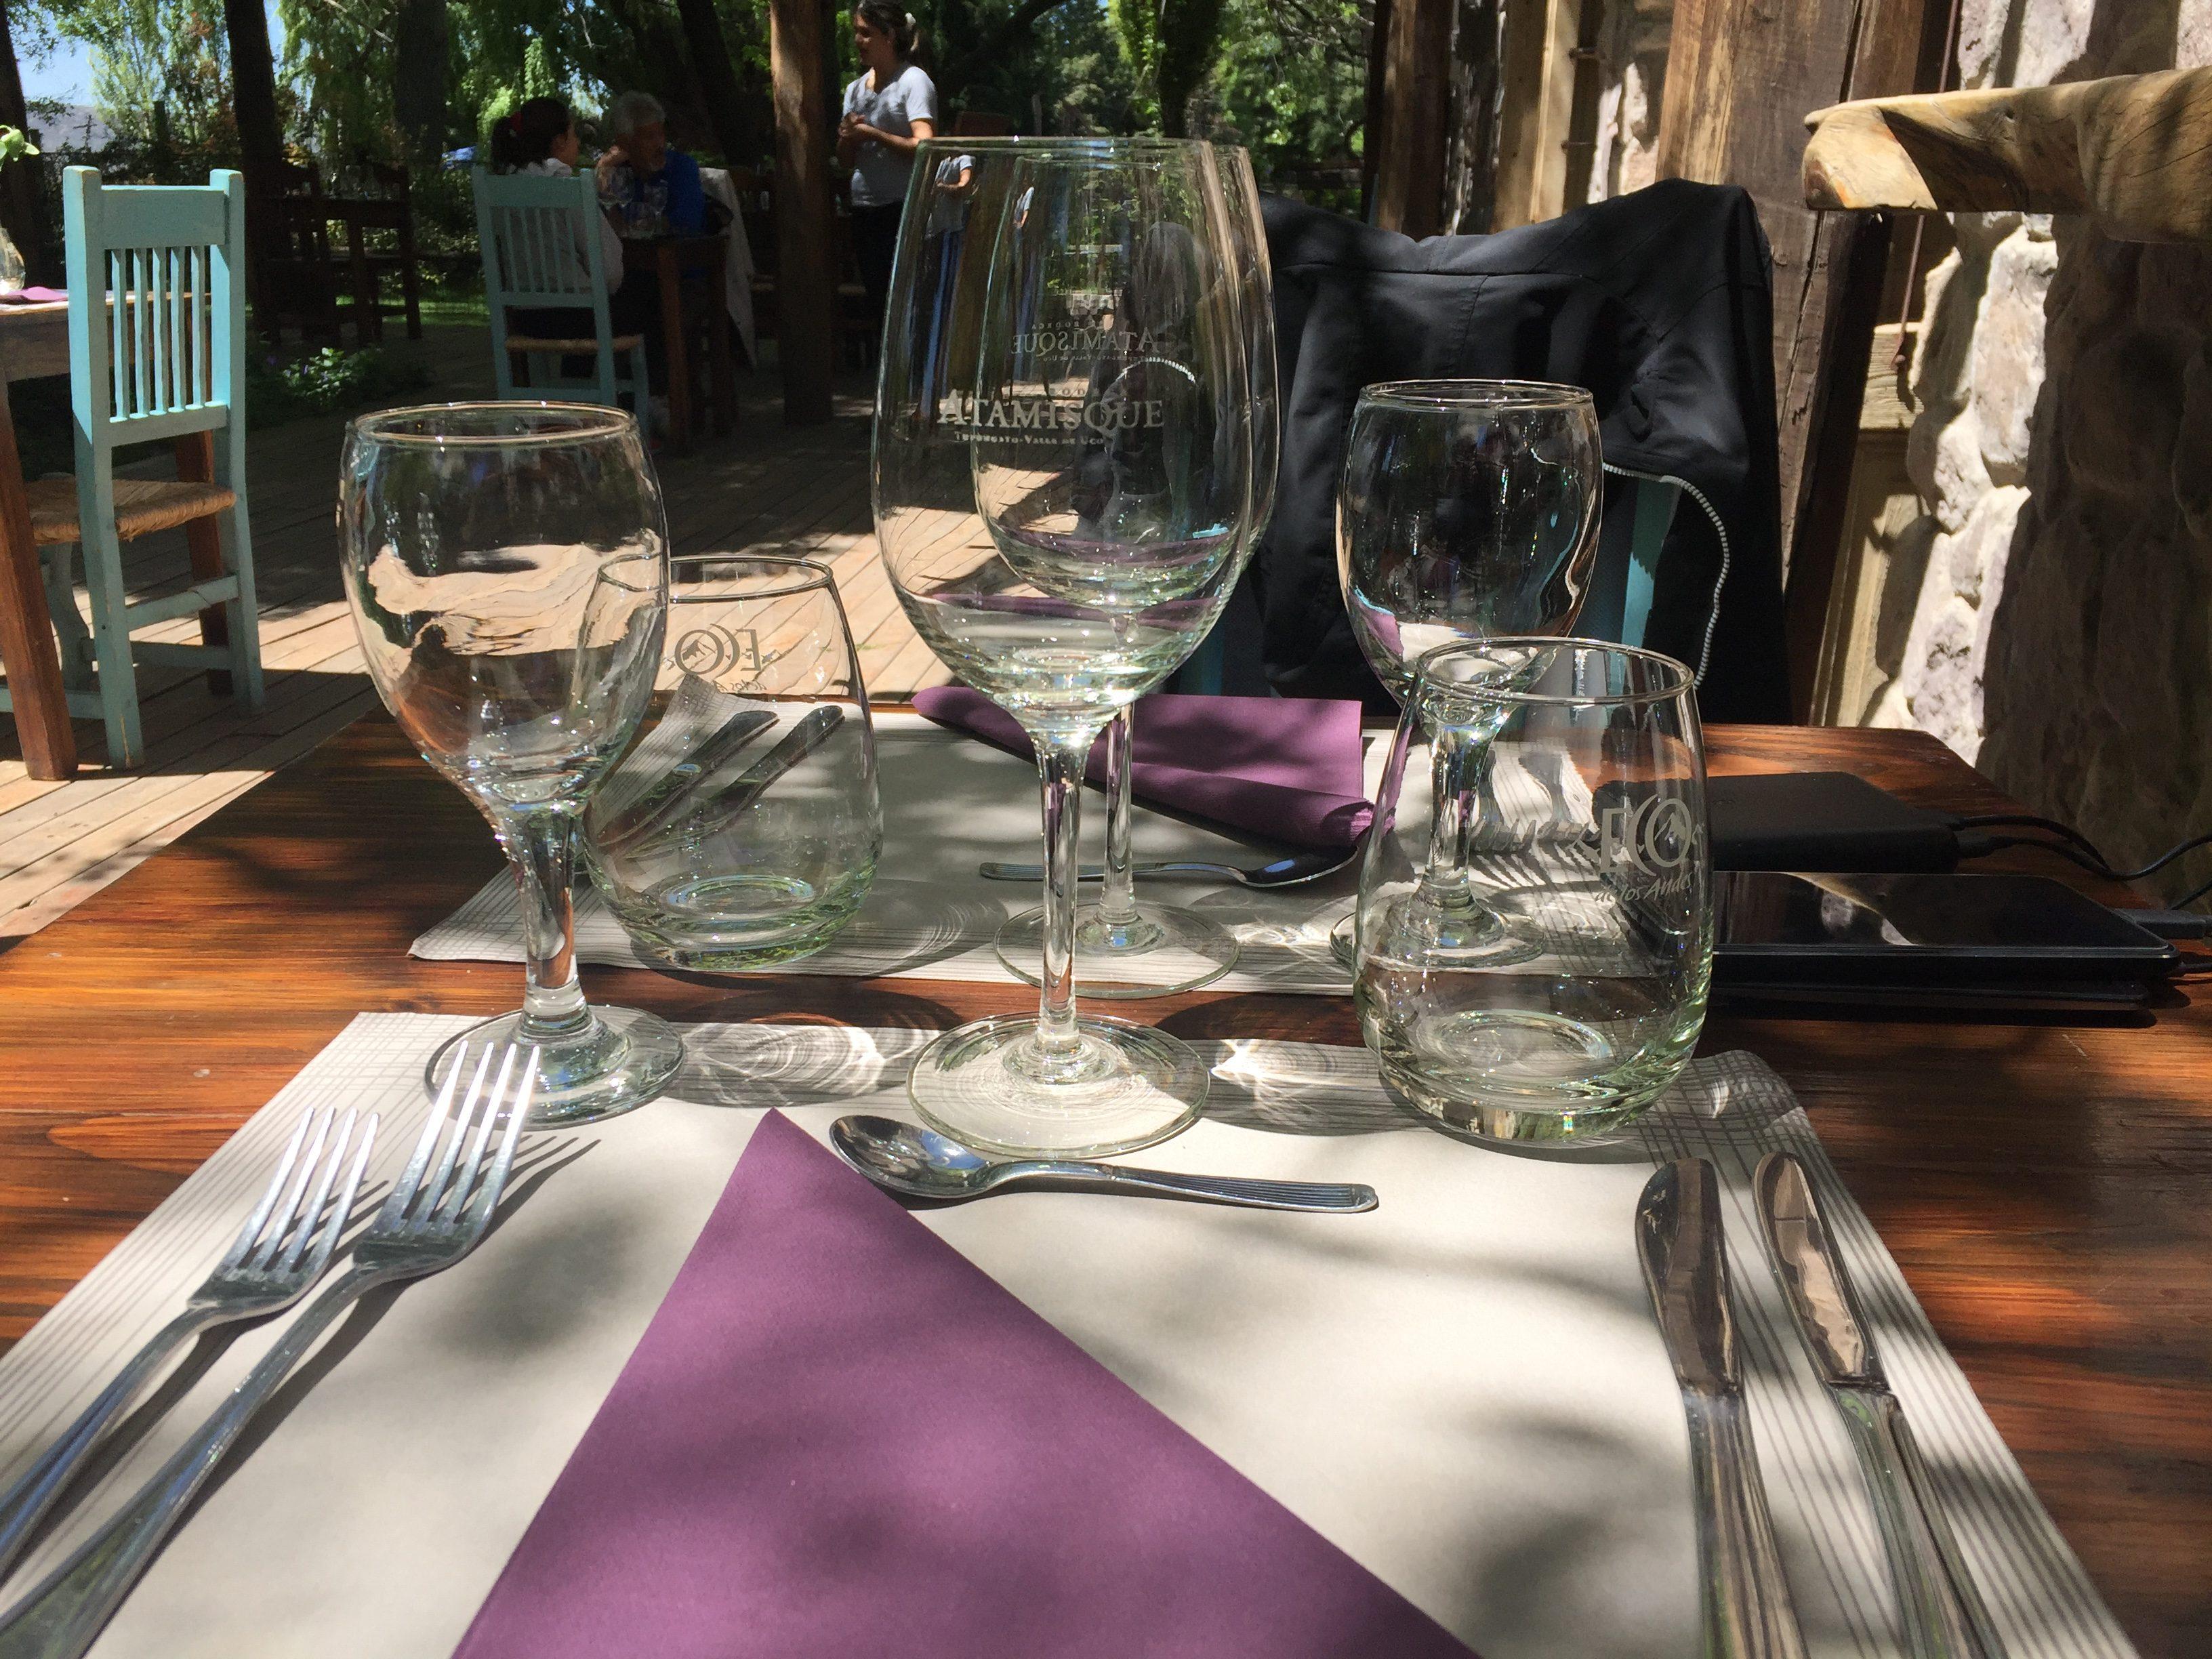 IMG 8358 e1508807992539 - Almorzando en la Bodega Atamisque de Mendoza